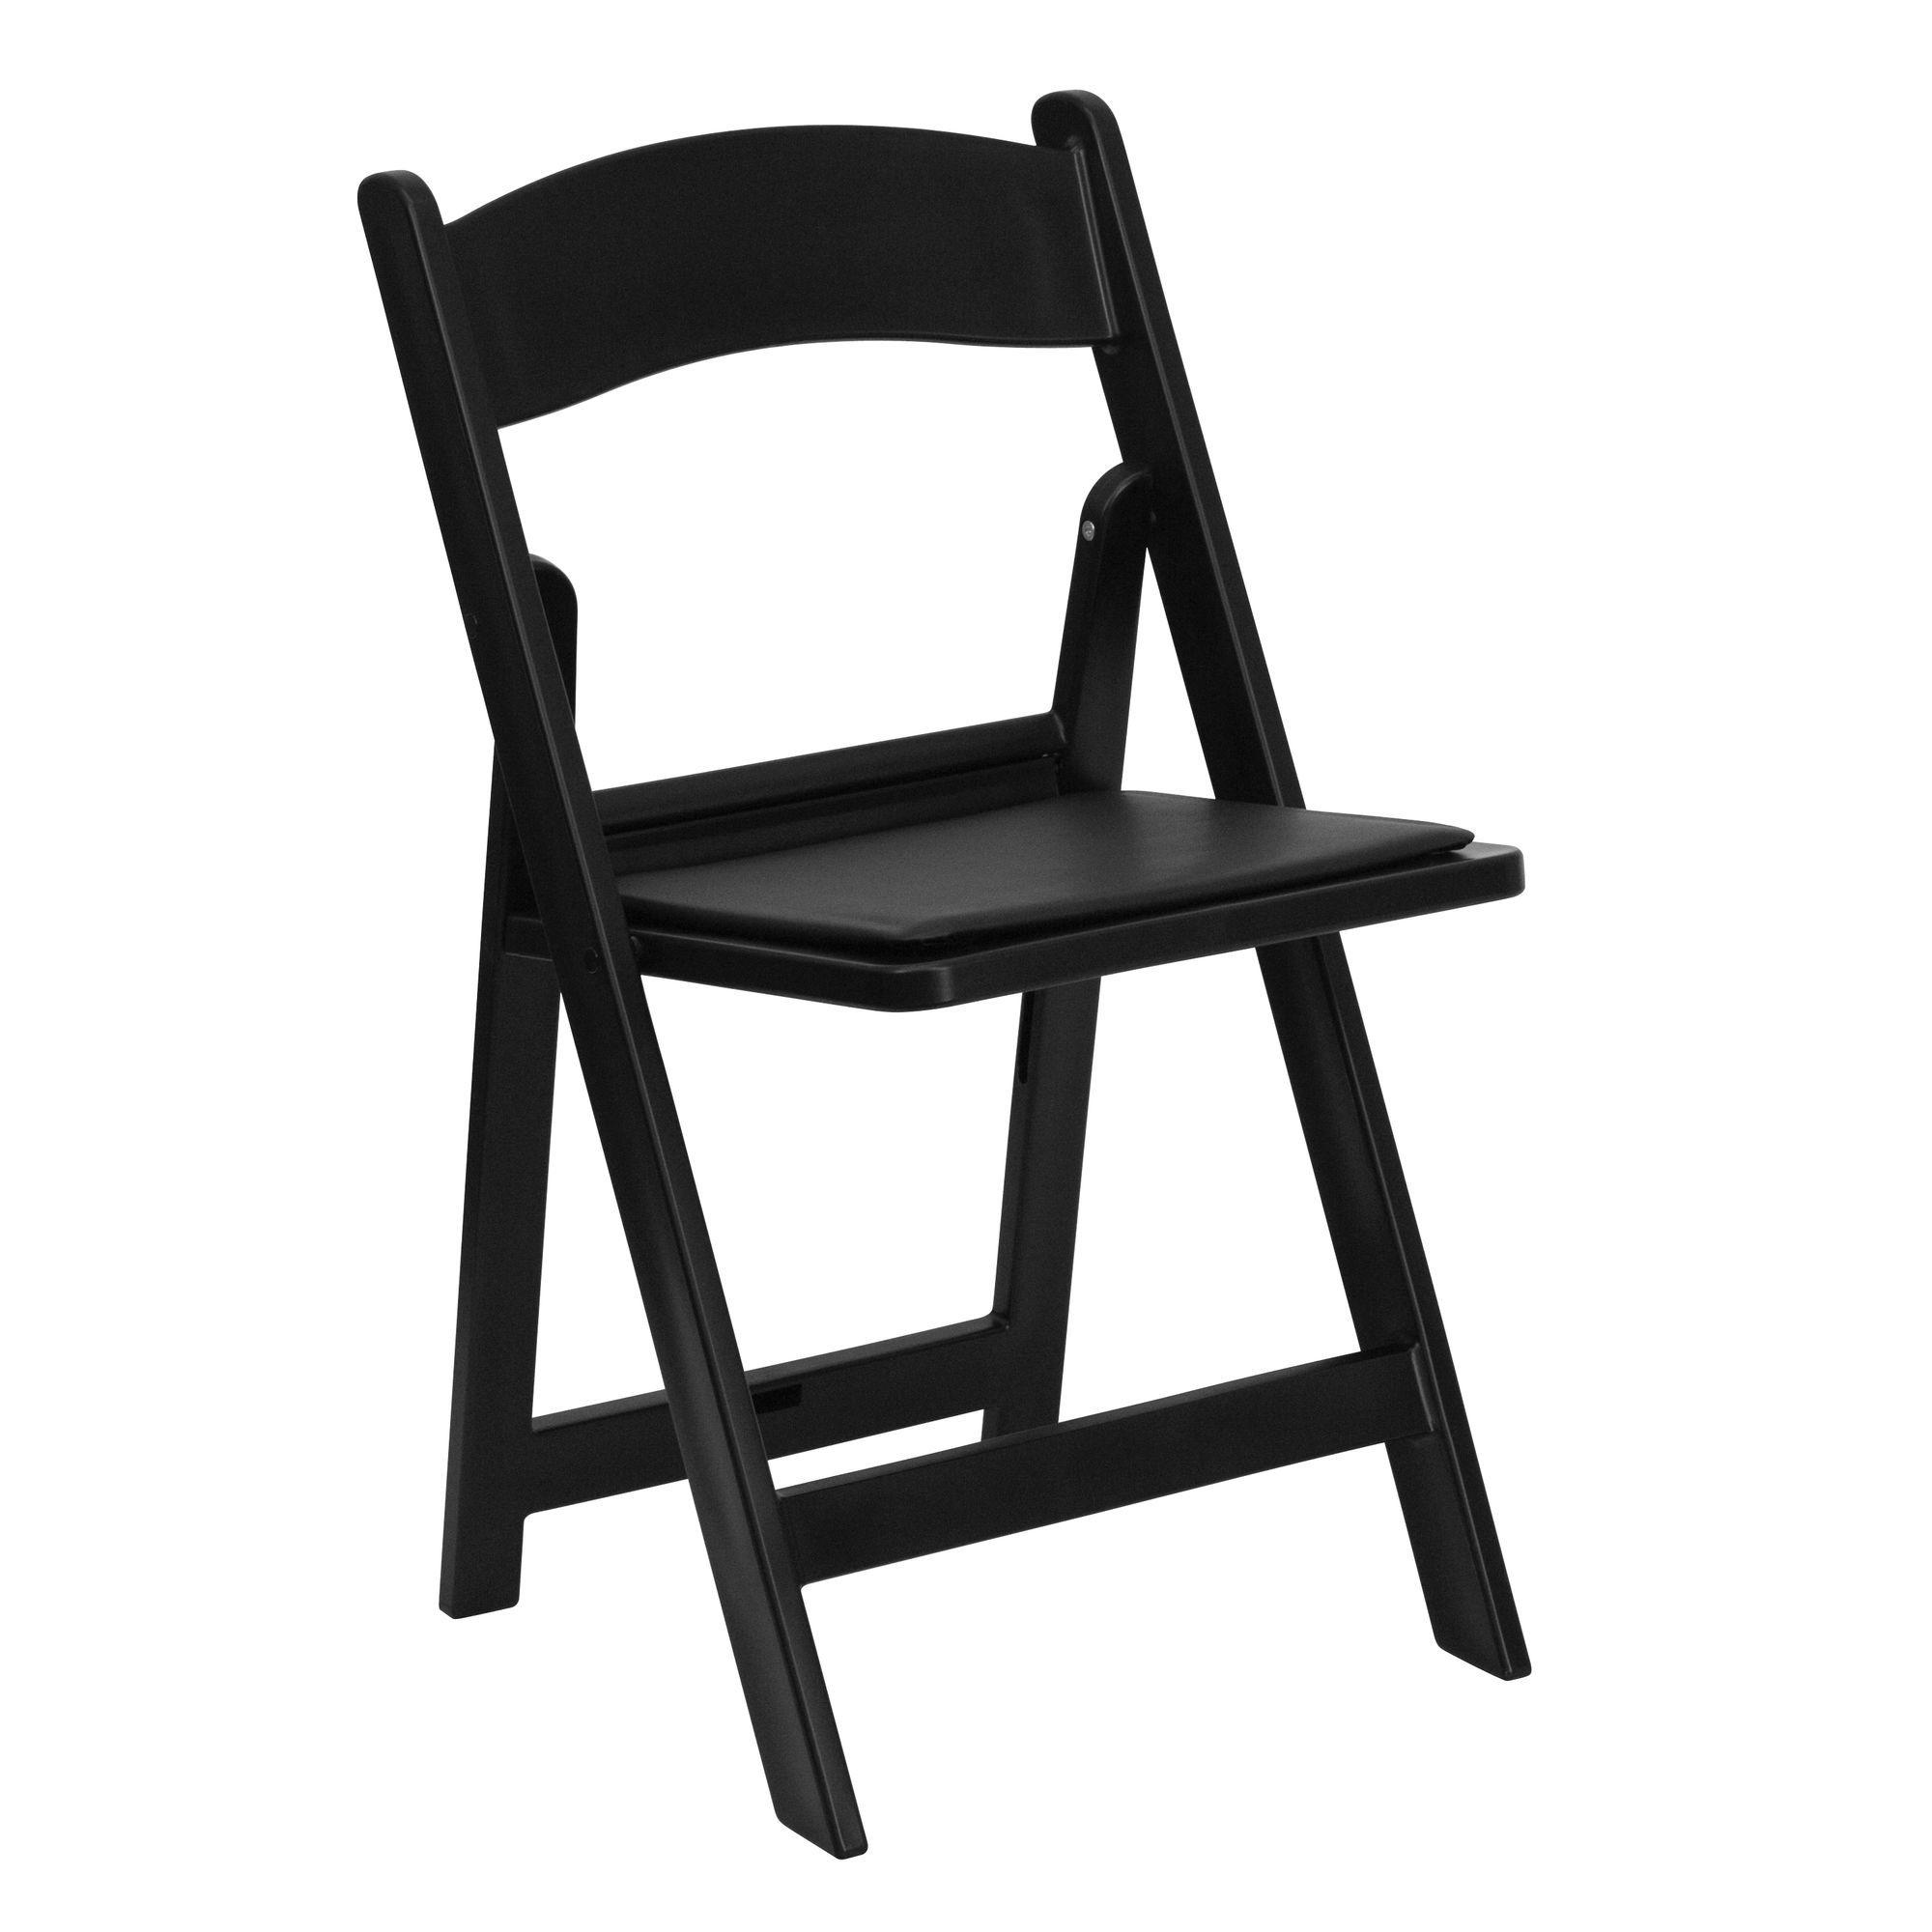 Hercules Series 1000 Lb Capacity Black Resin Folding Chair With